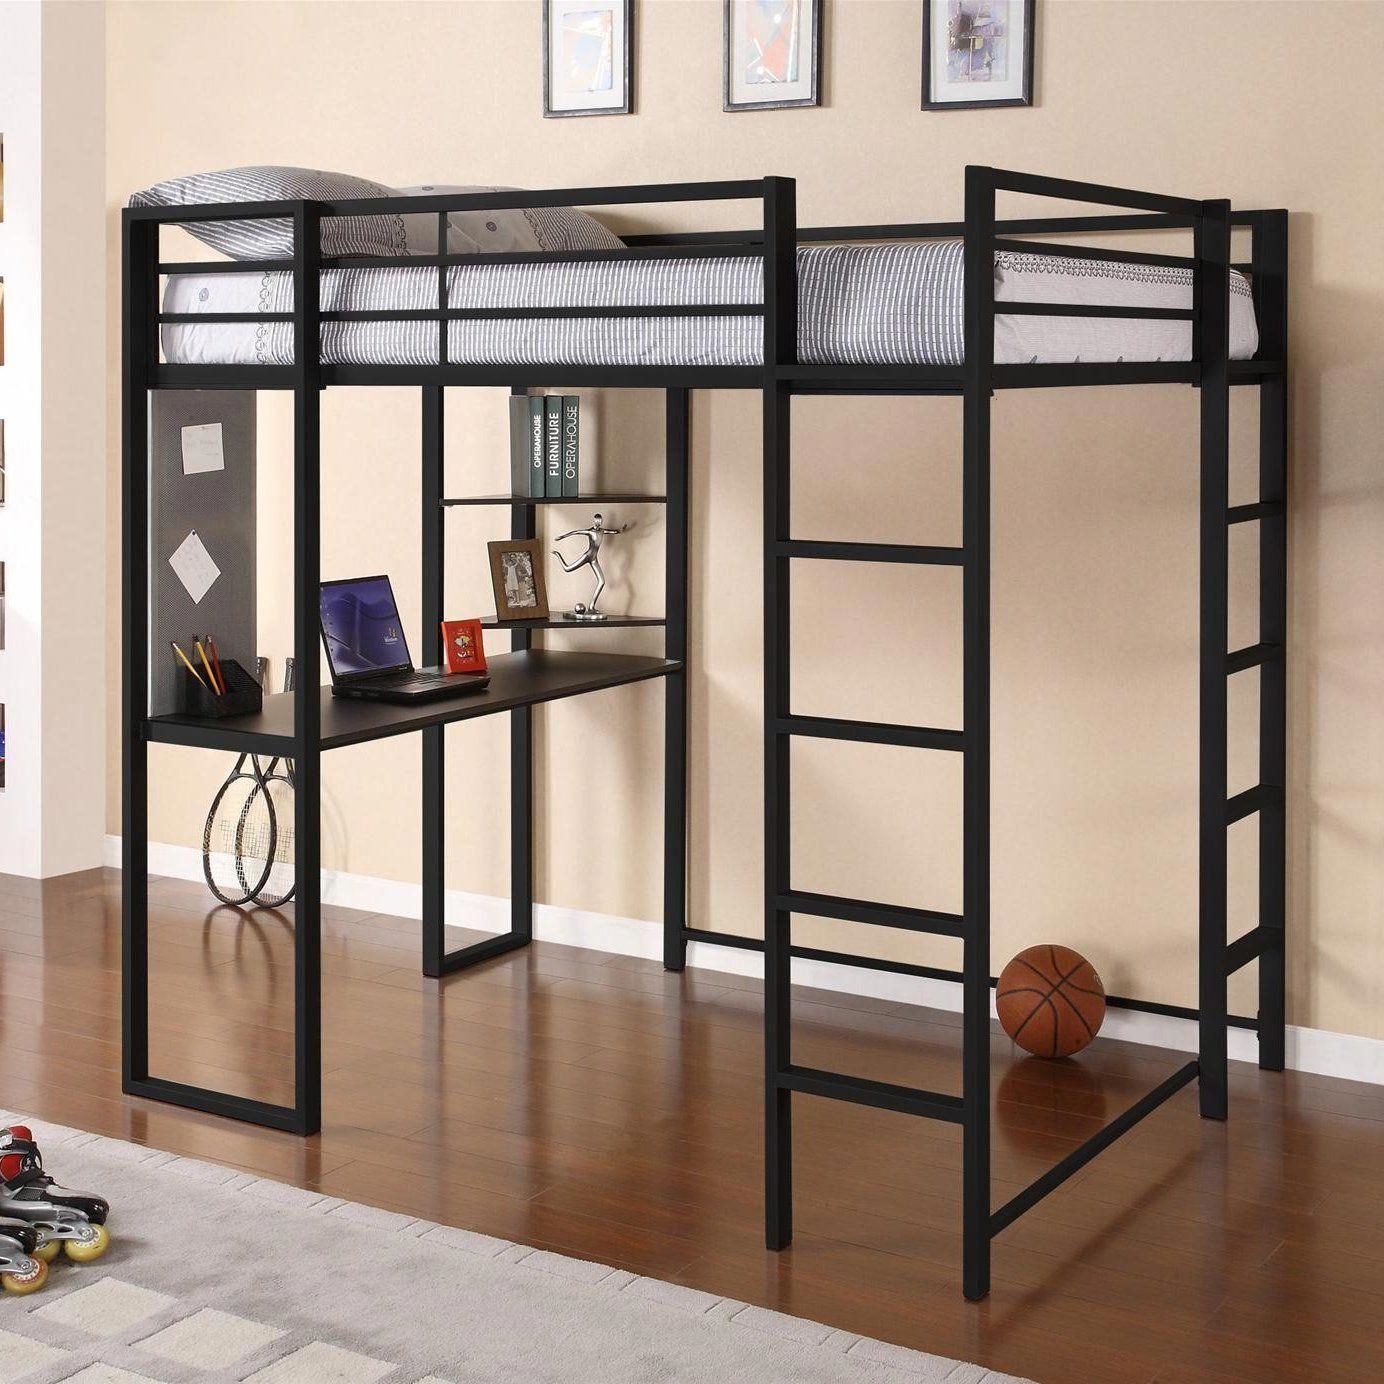 Loft bed ideas diy  Abode Full Loft Bed udbunkbedideasforsmallroomsud  bunk bed ideas